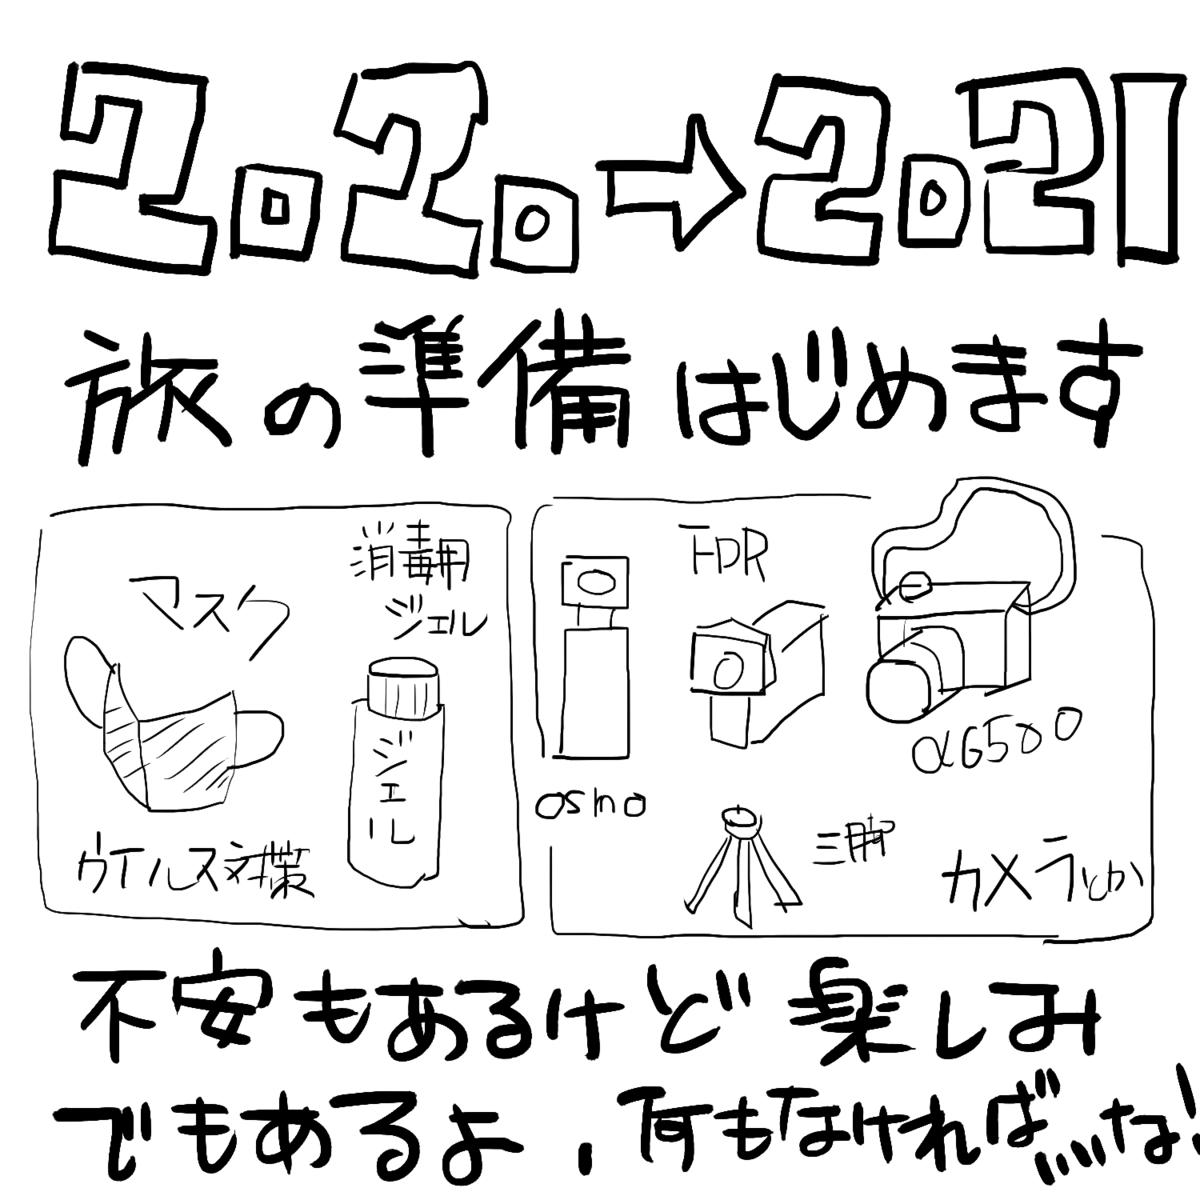 f:id:zomuzomu:20201127115821p:plain